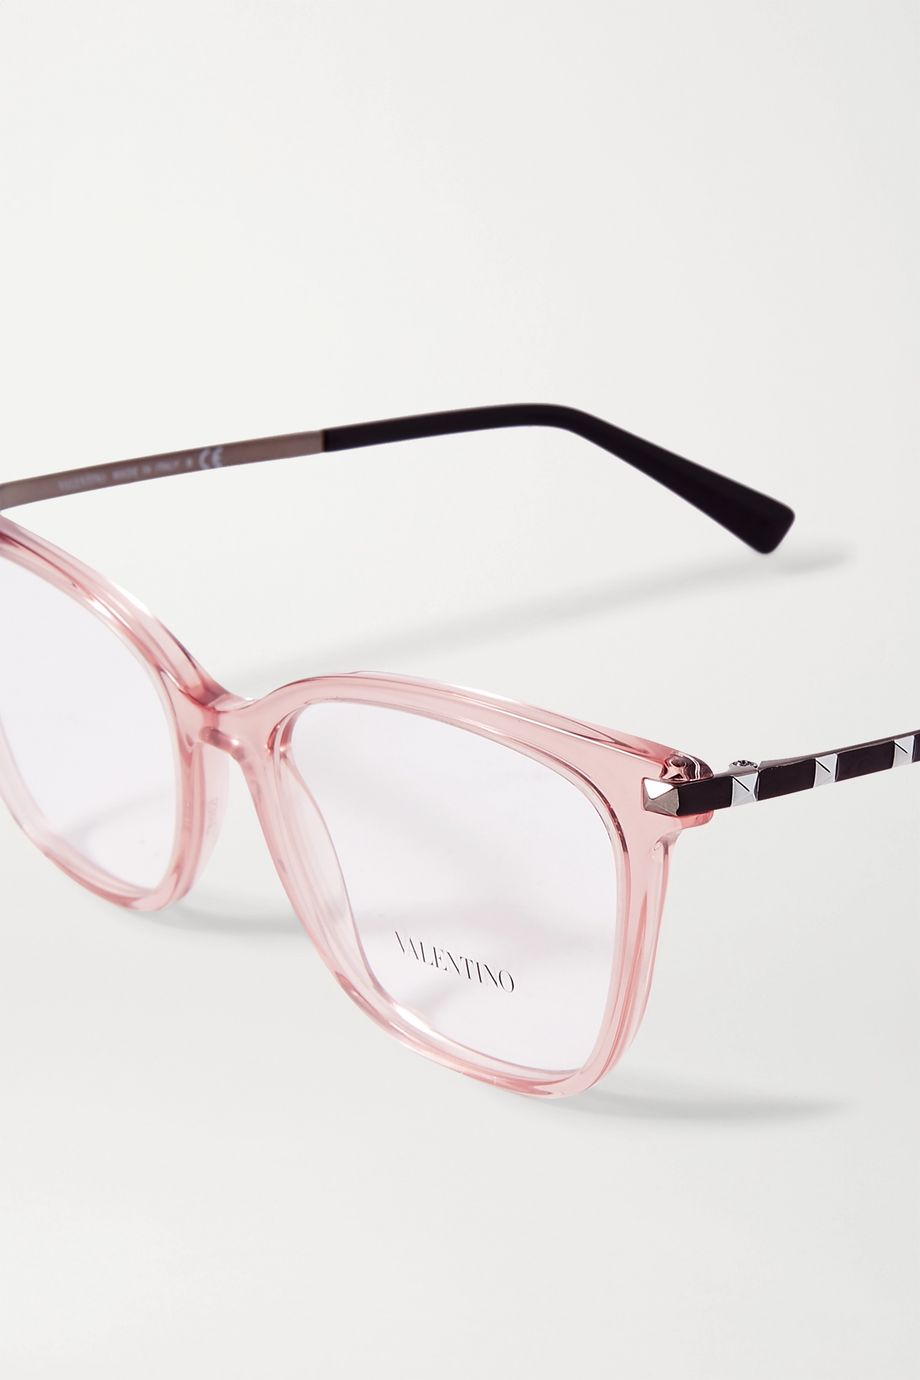 Valentino Valentino Garavani Rockstud square-frame acetate optical glasses